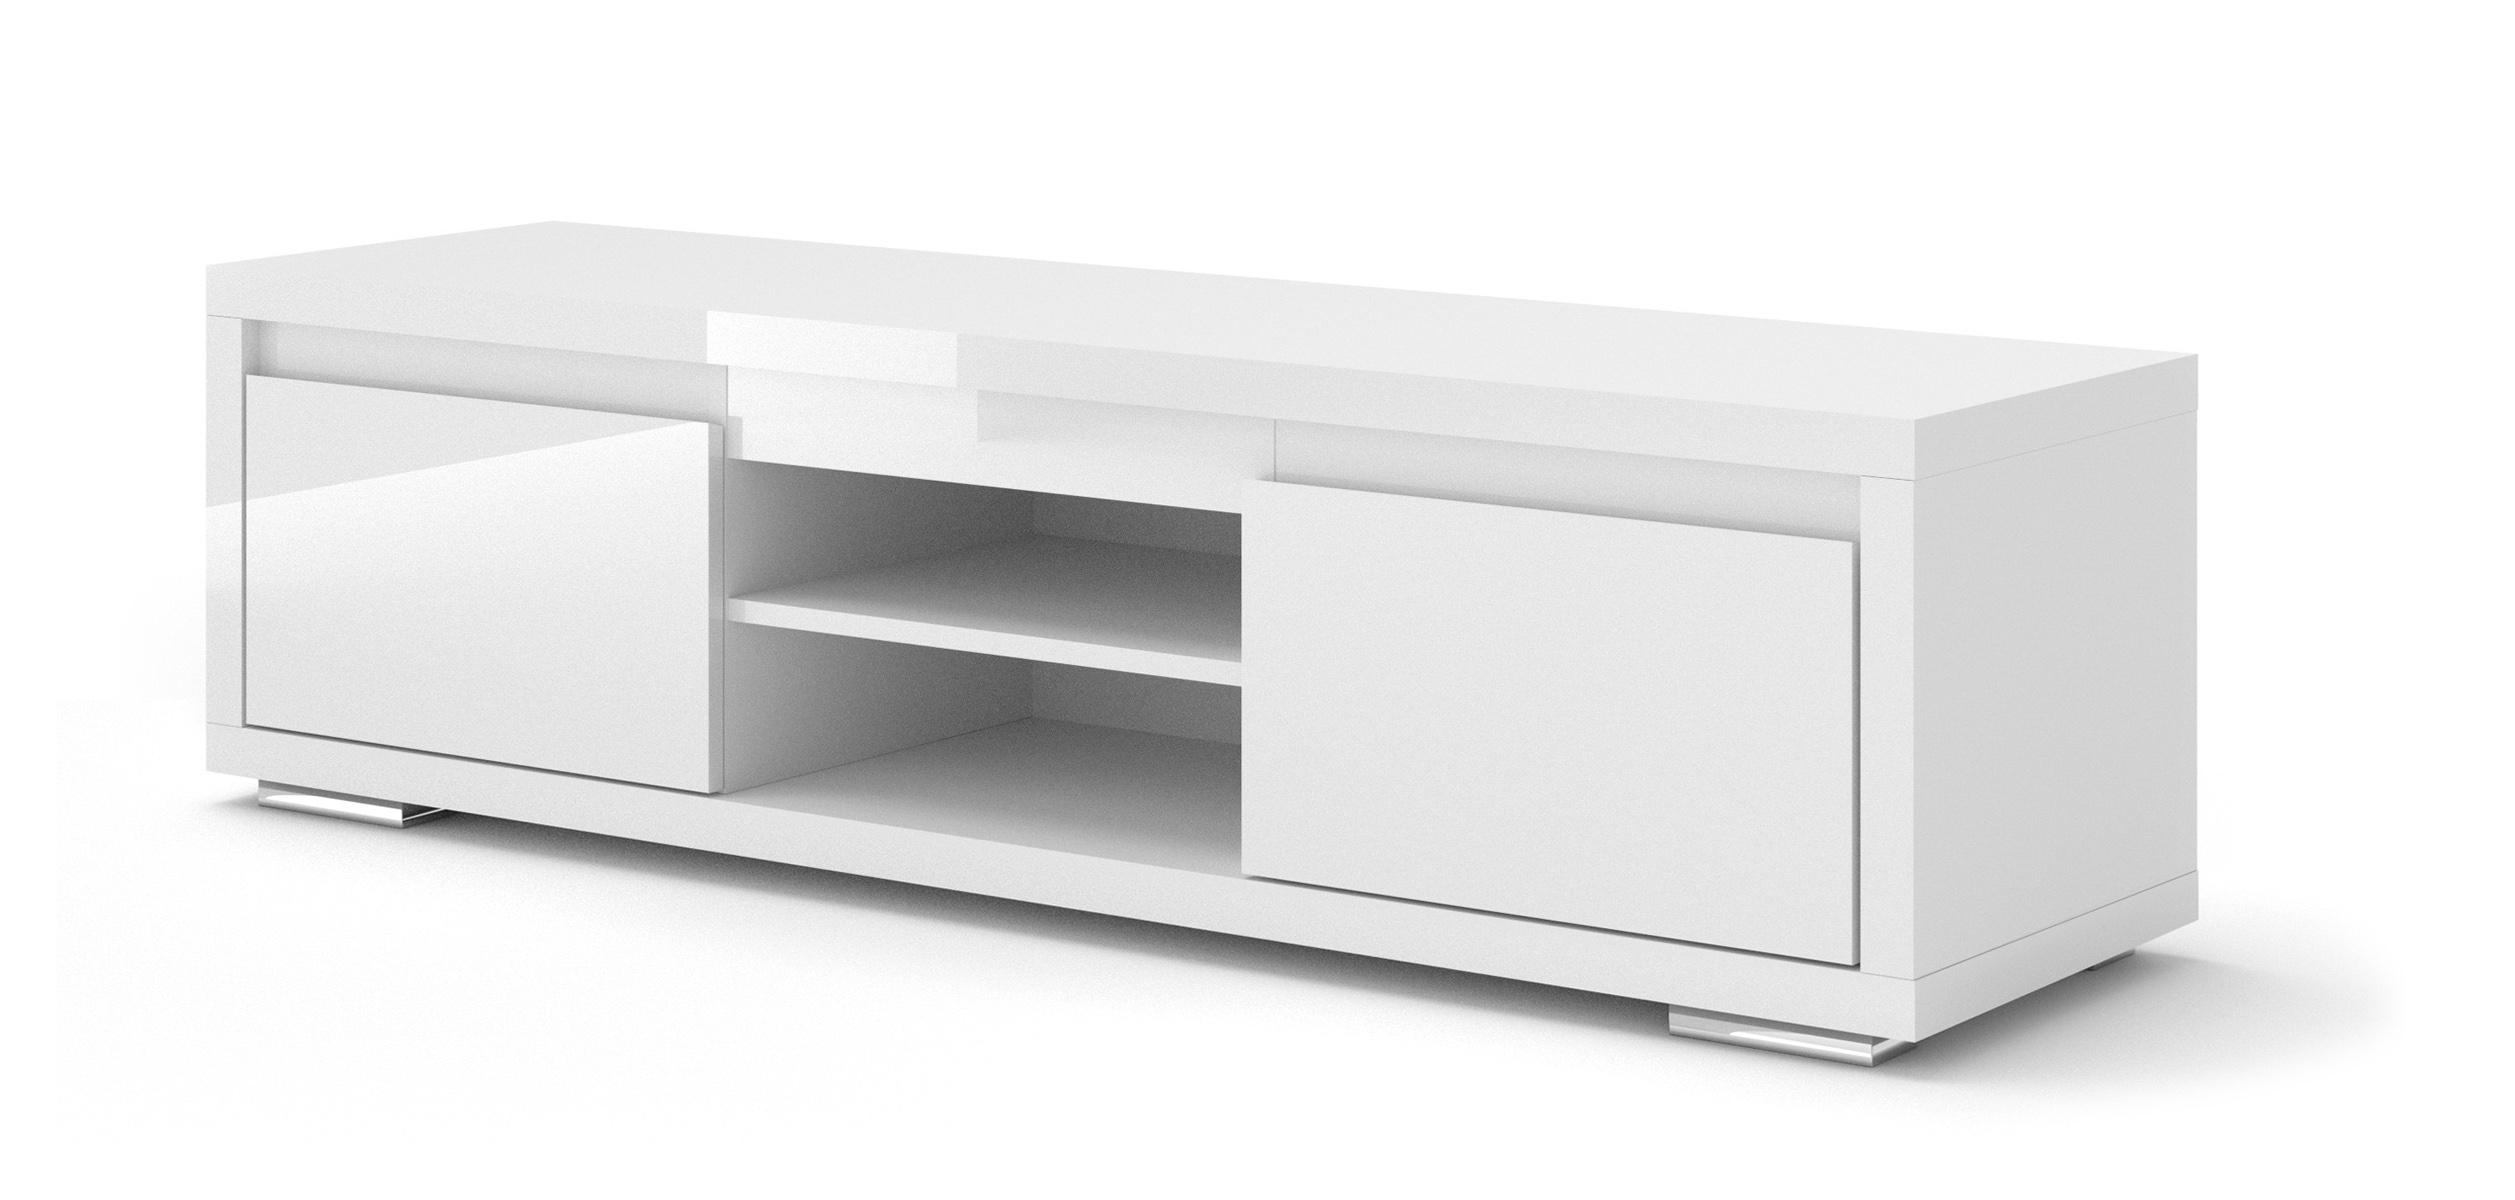 ARTBm TV stolík NORDIC BIANCO 03 Prevedenie: TV stolík NORDIC BIANCO 03 bez nožičiek